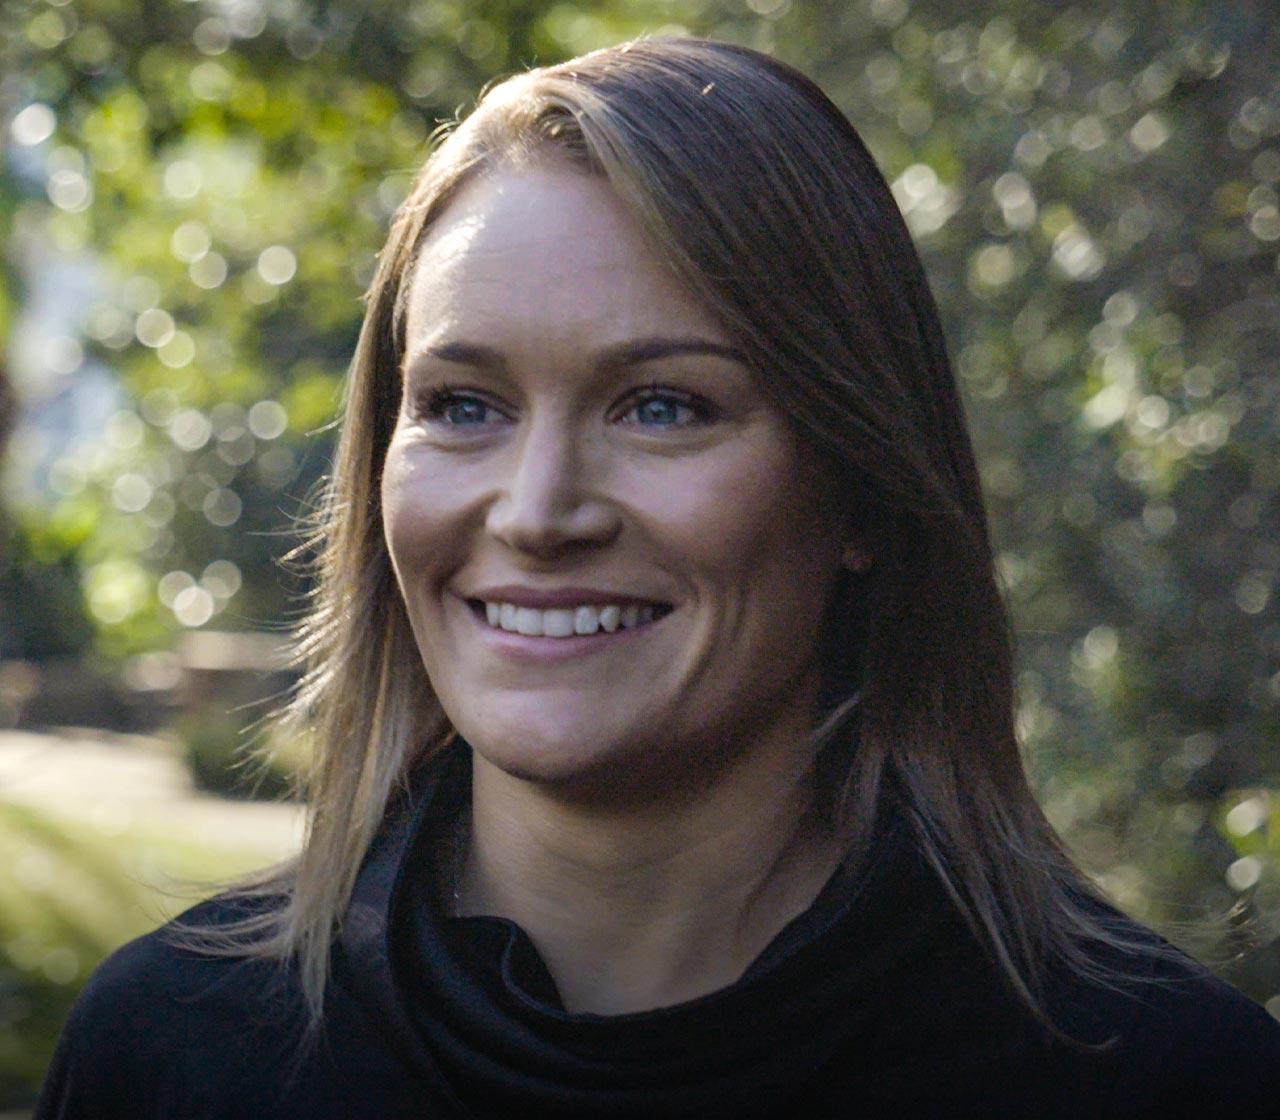 Sami Kennedy-Sim - Olympic Sports - PlayersVoice